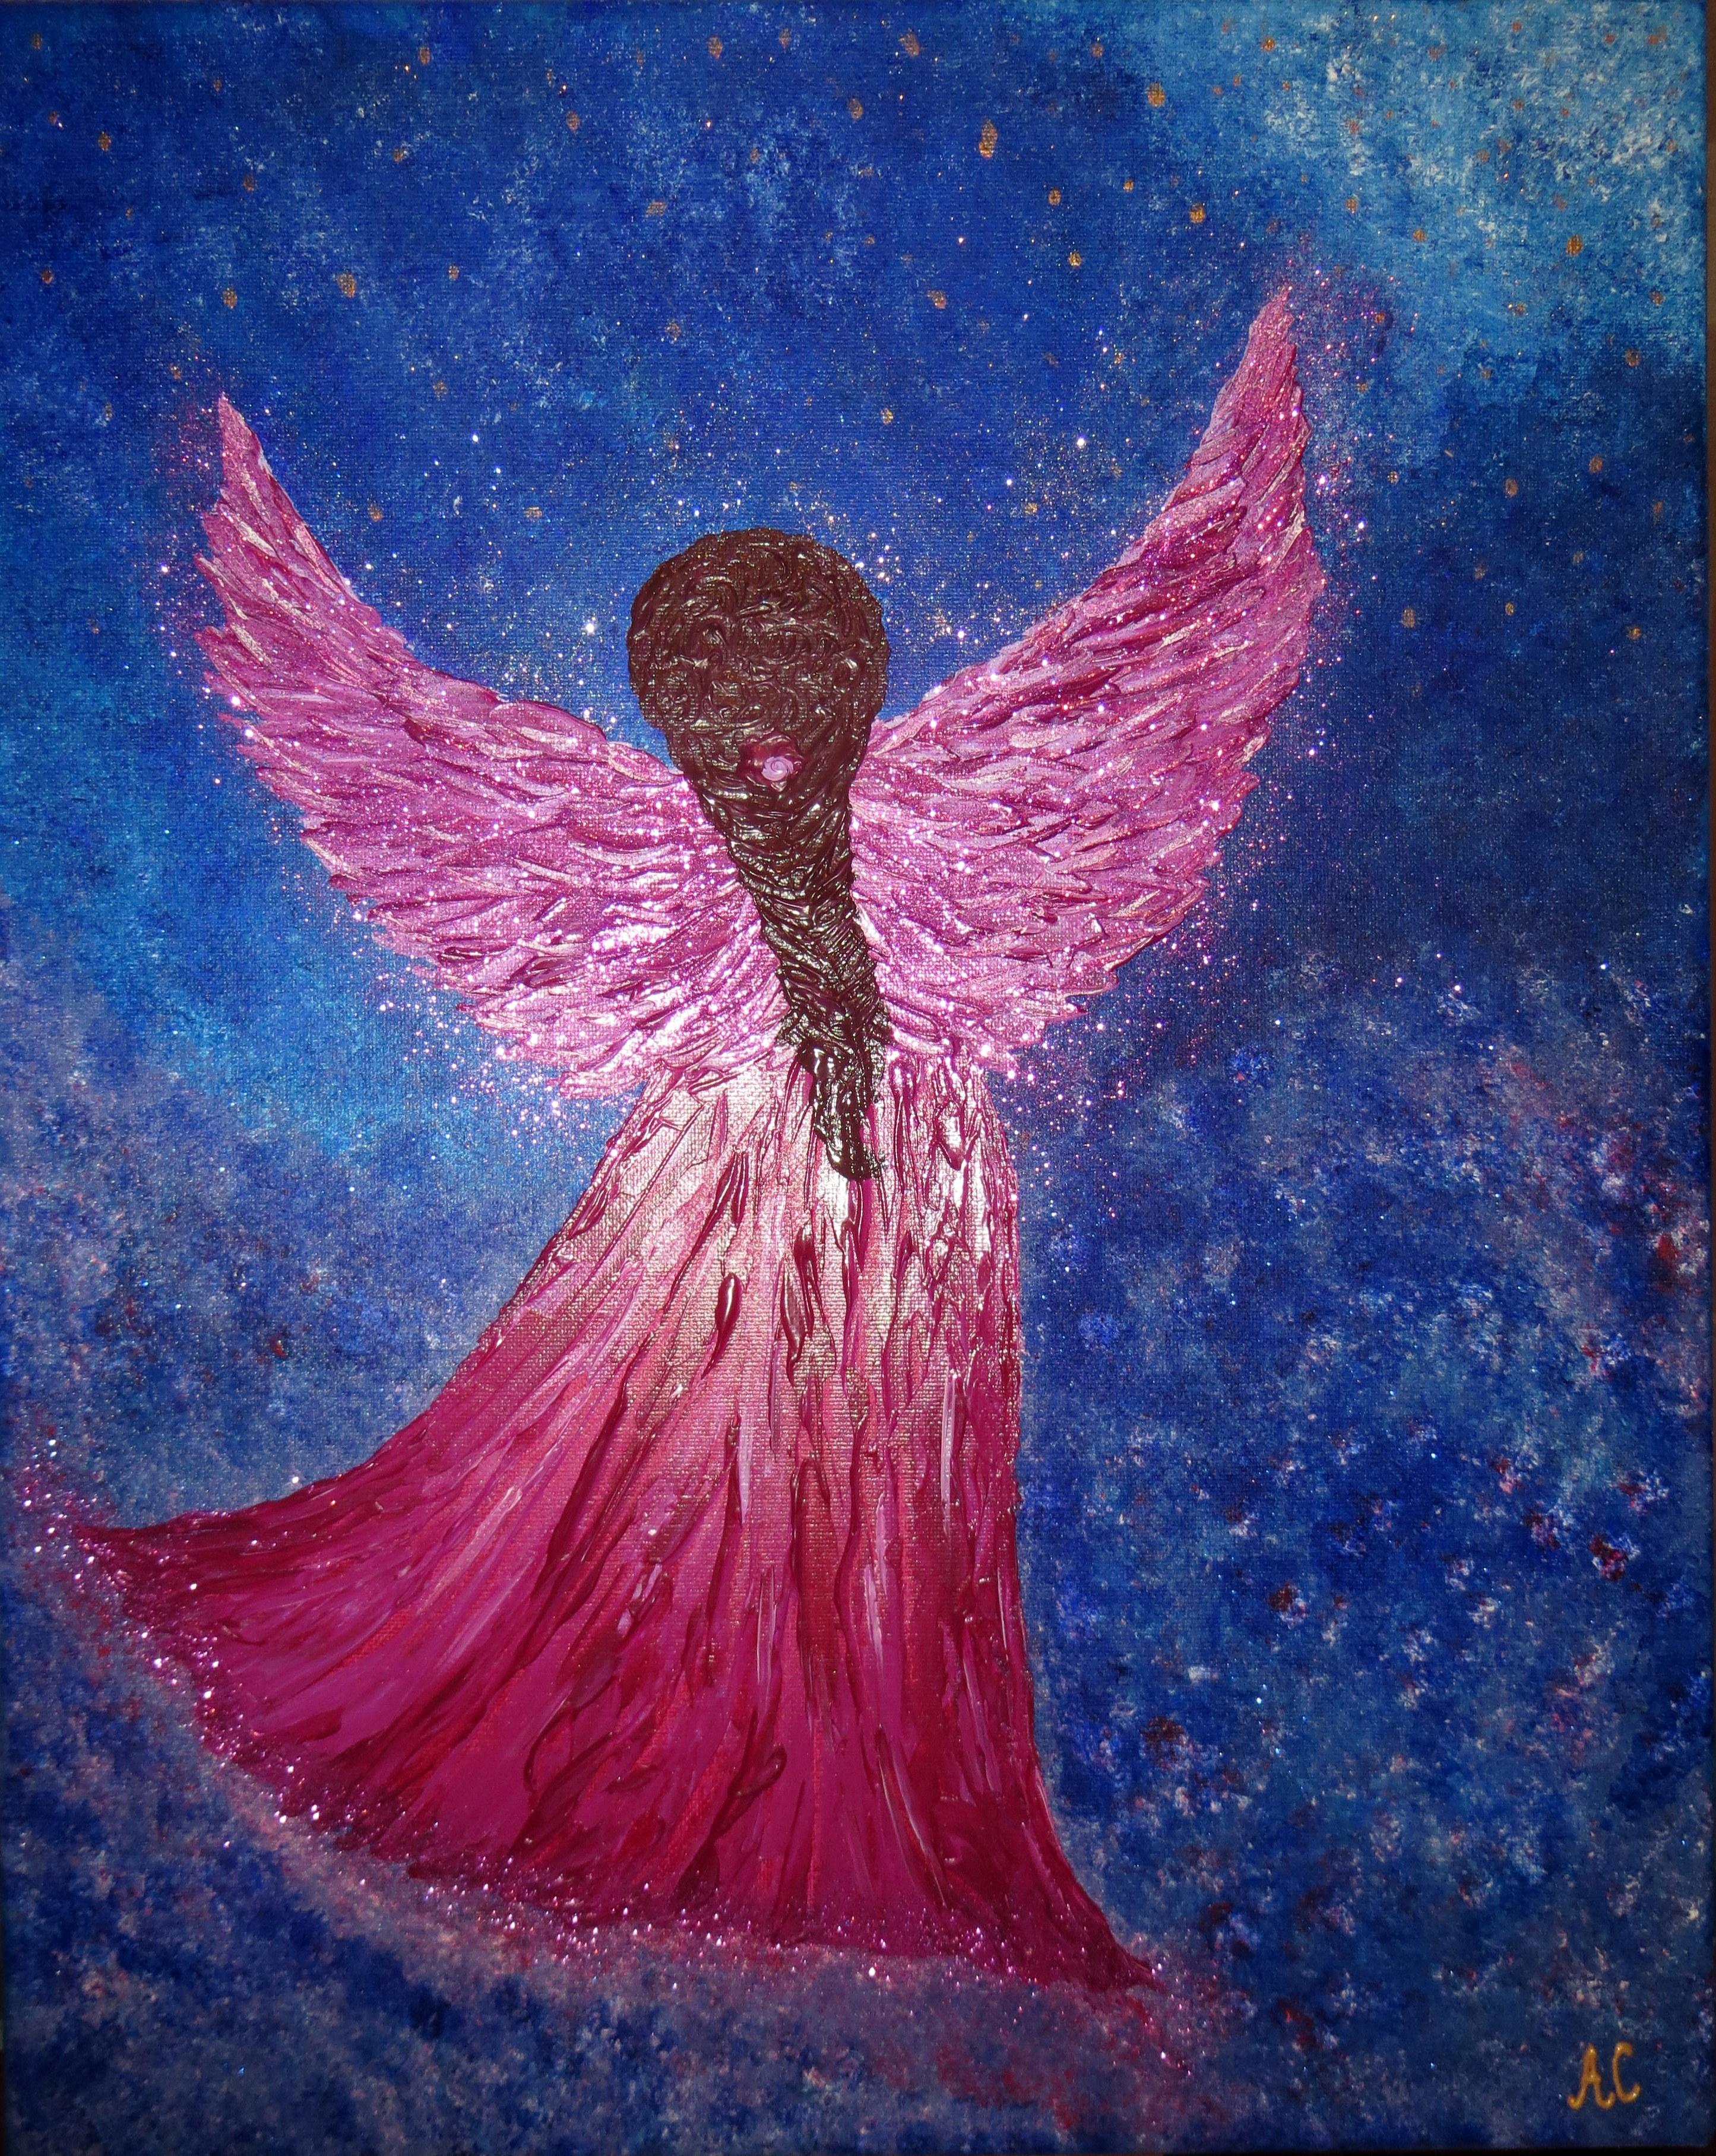 L'Ange scintillant